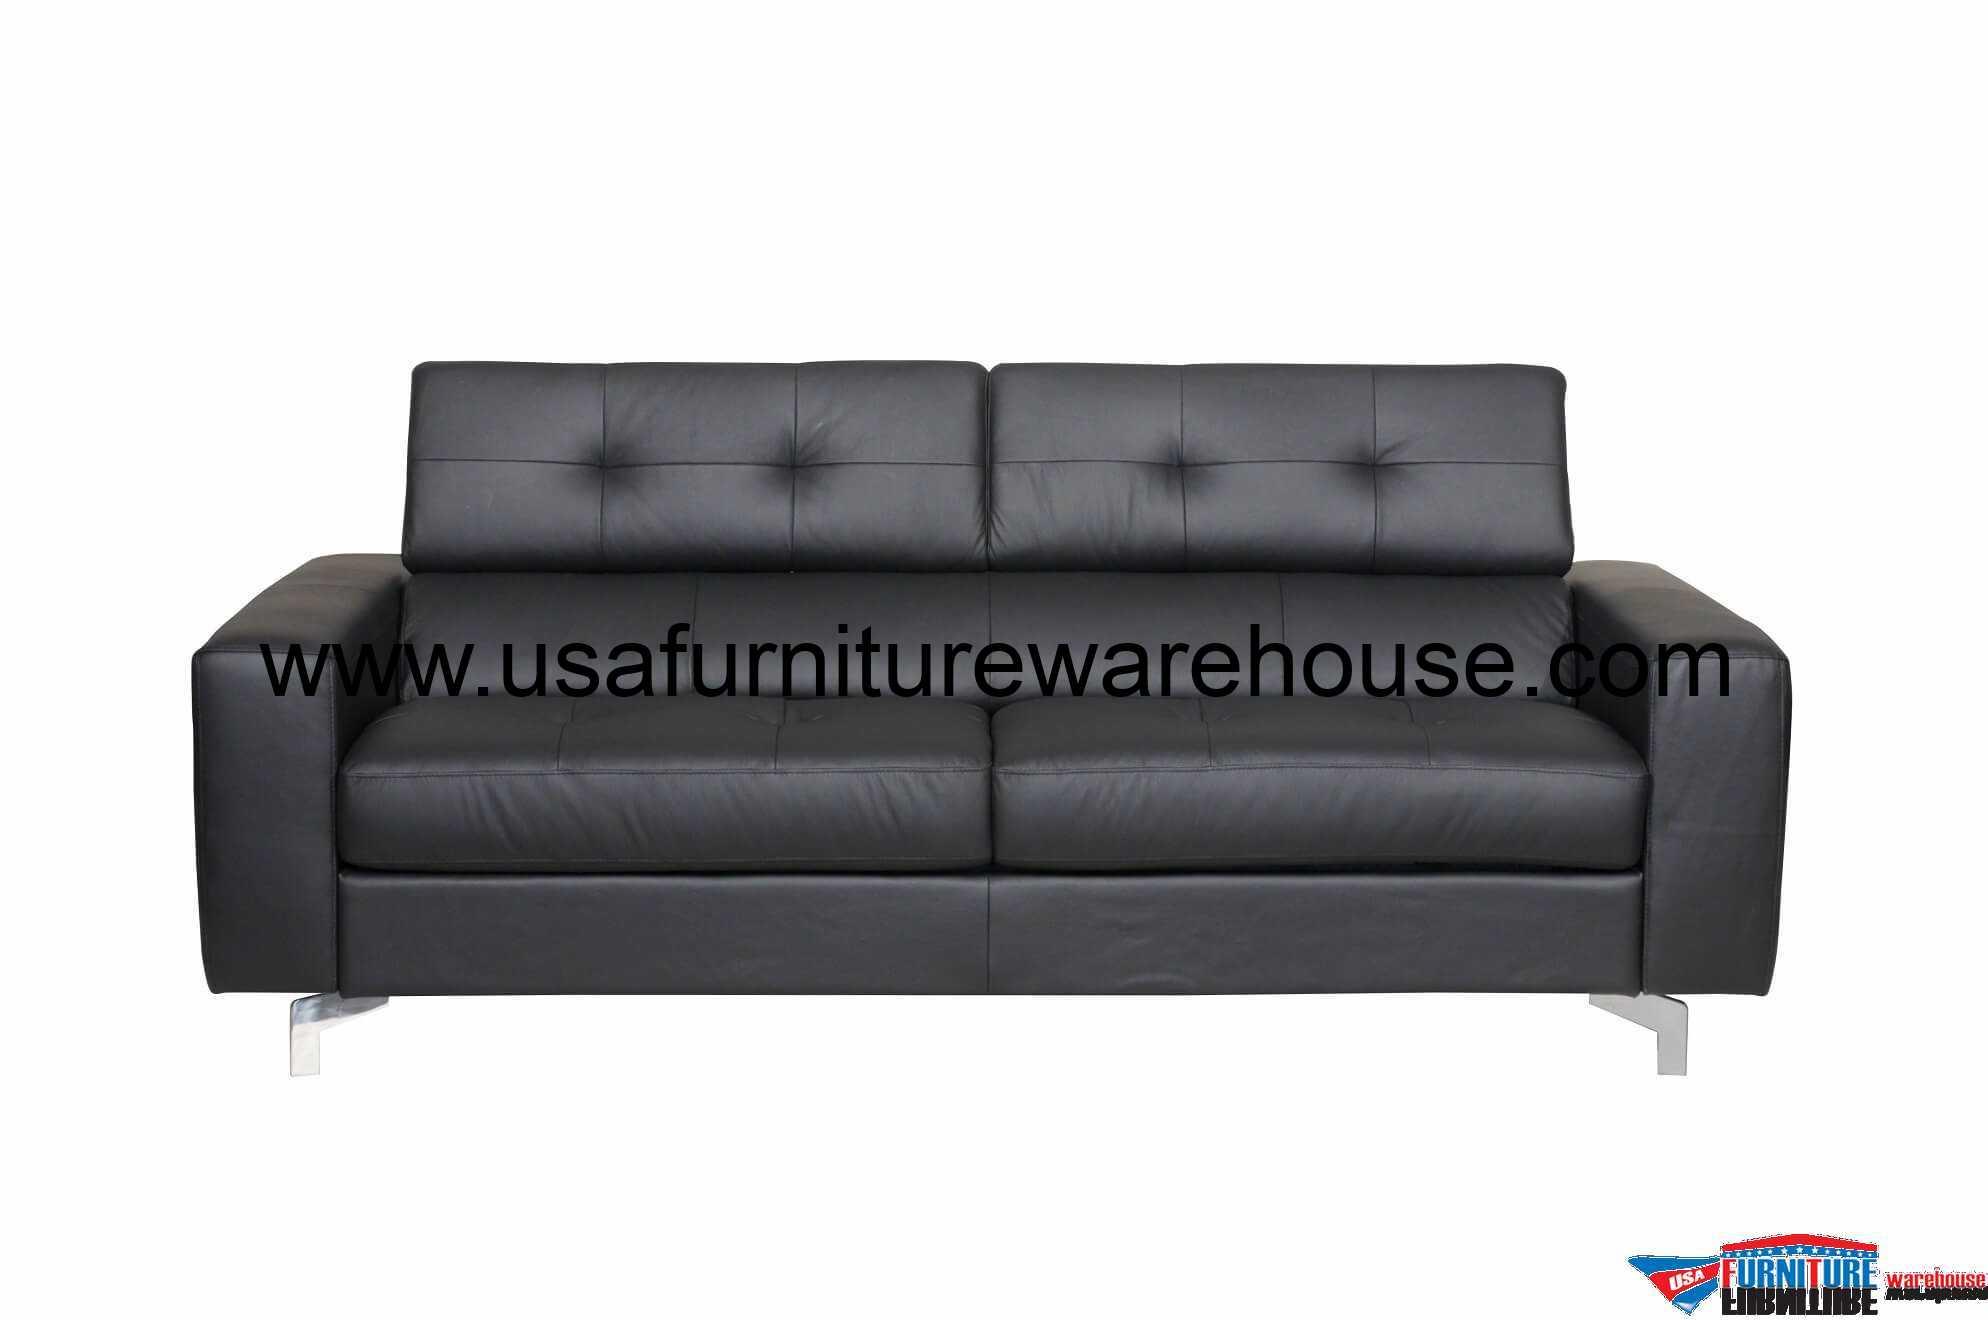 Tevere Black Top Grain Italian Leather Sleeper Sofa